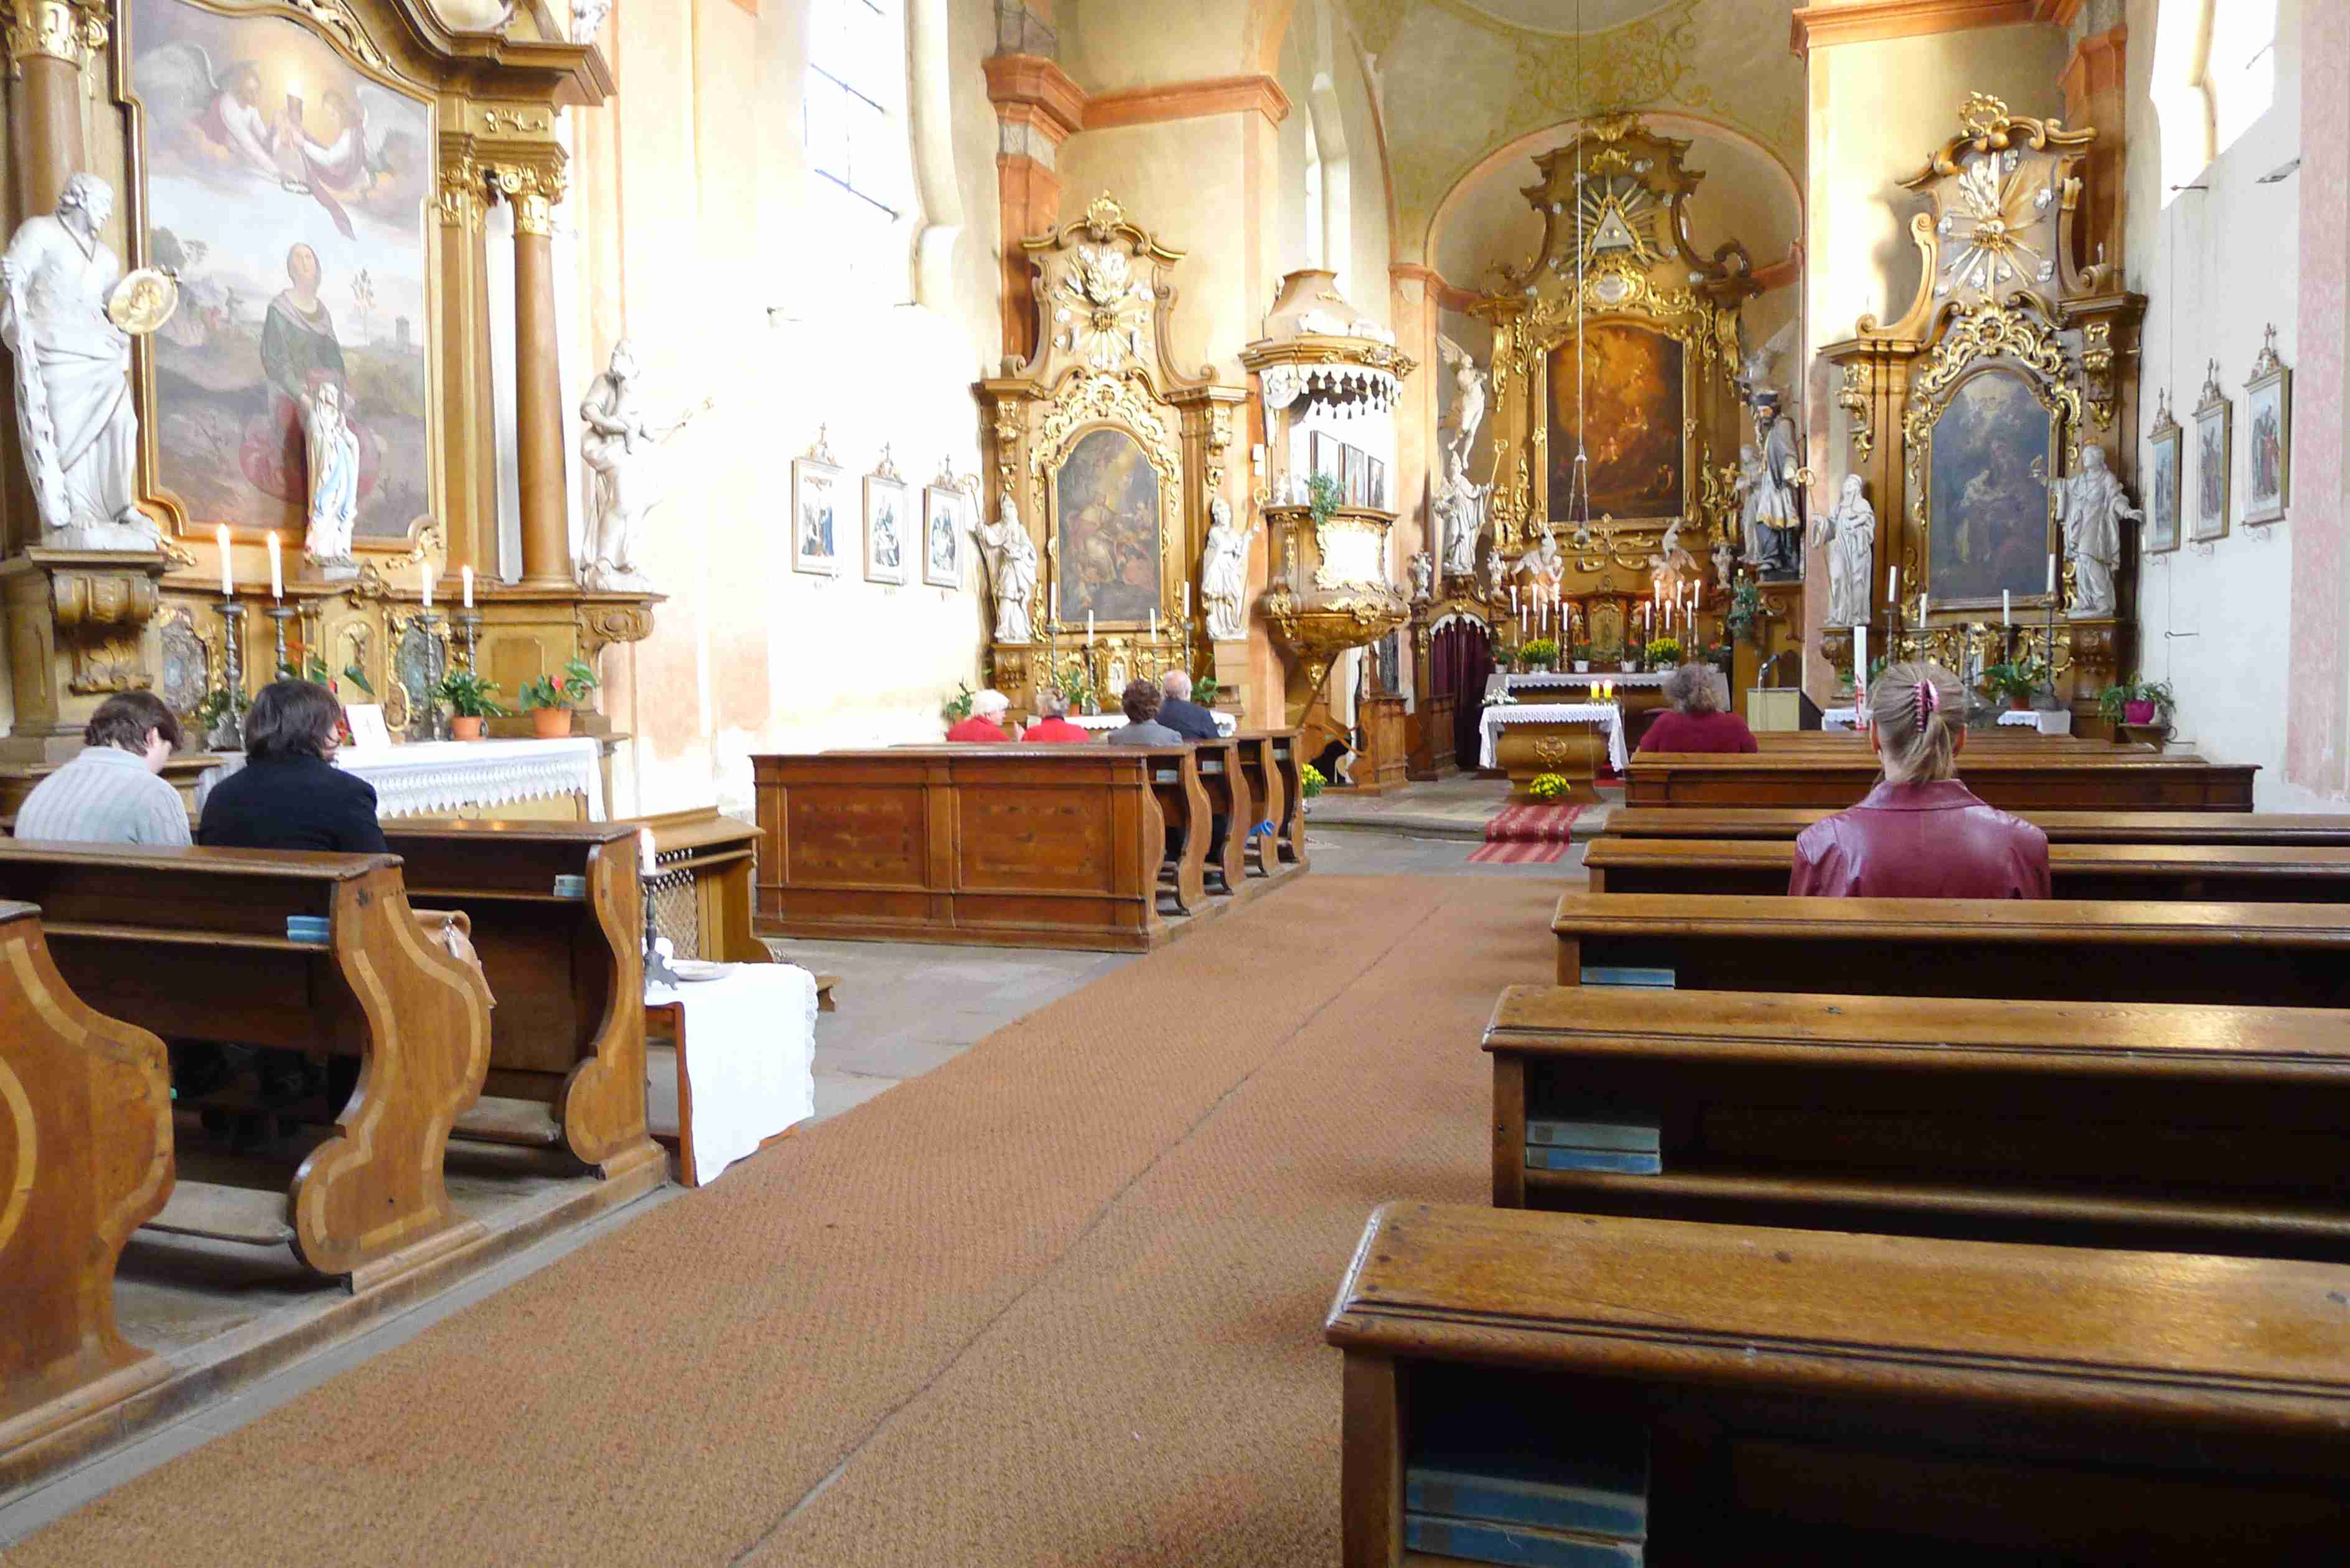 pouť ke sv. Františku 2014 - pátek - 1